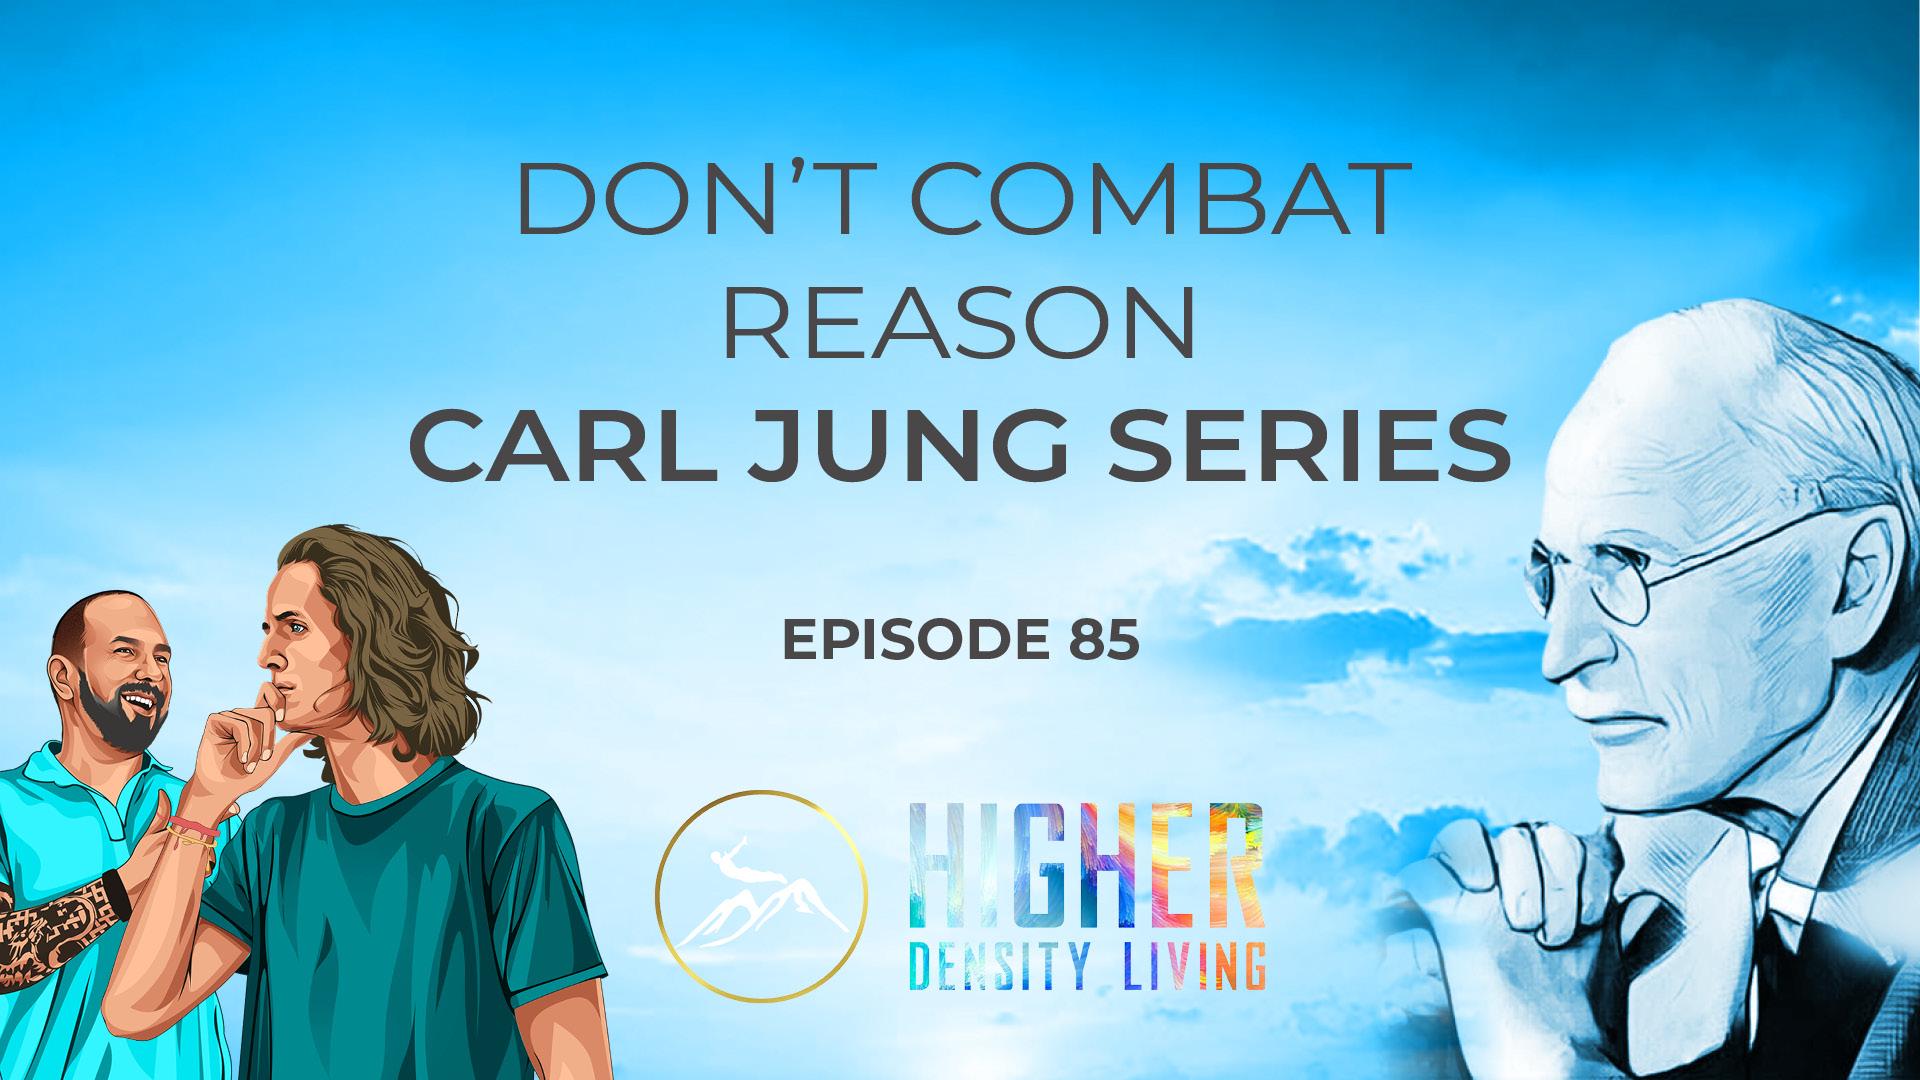 Don't Combat Reason - Carl Jung Series